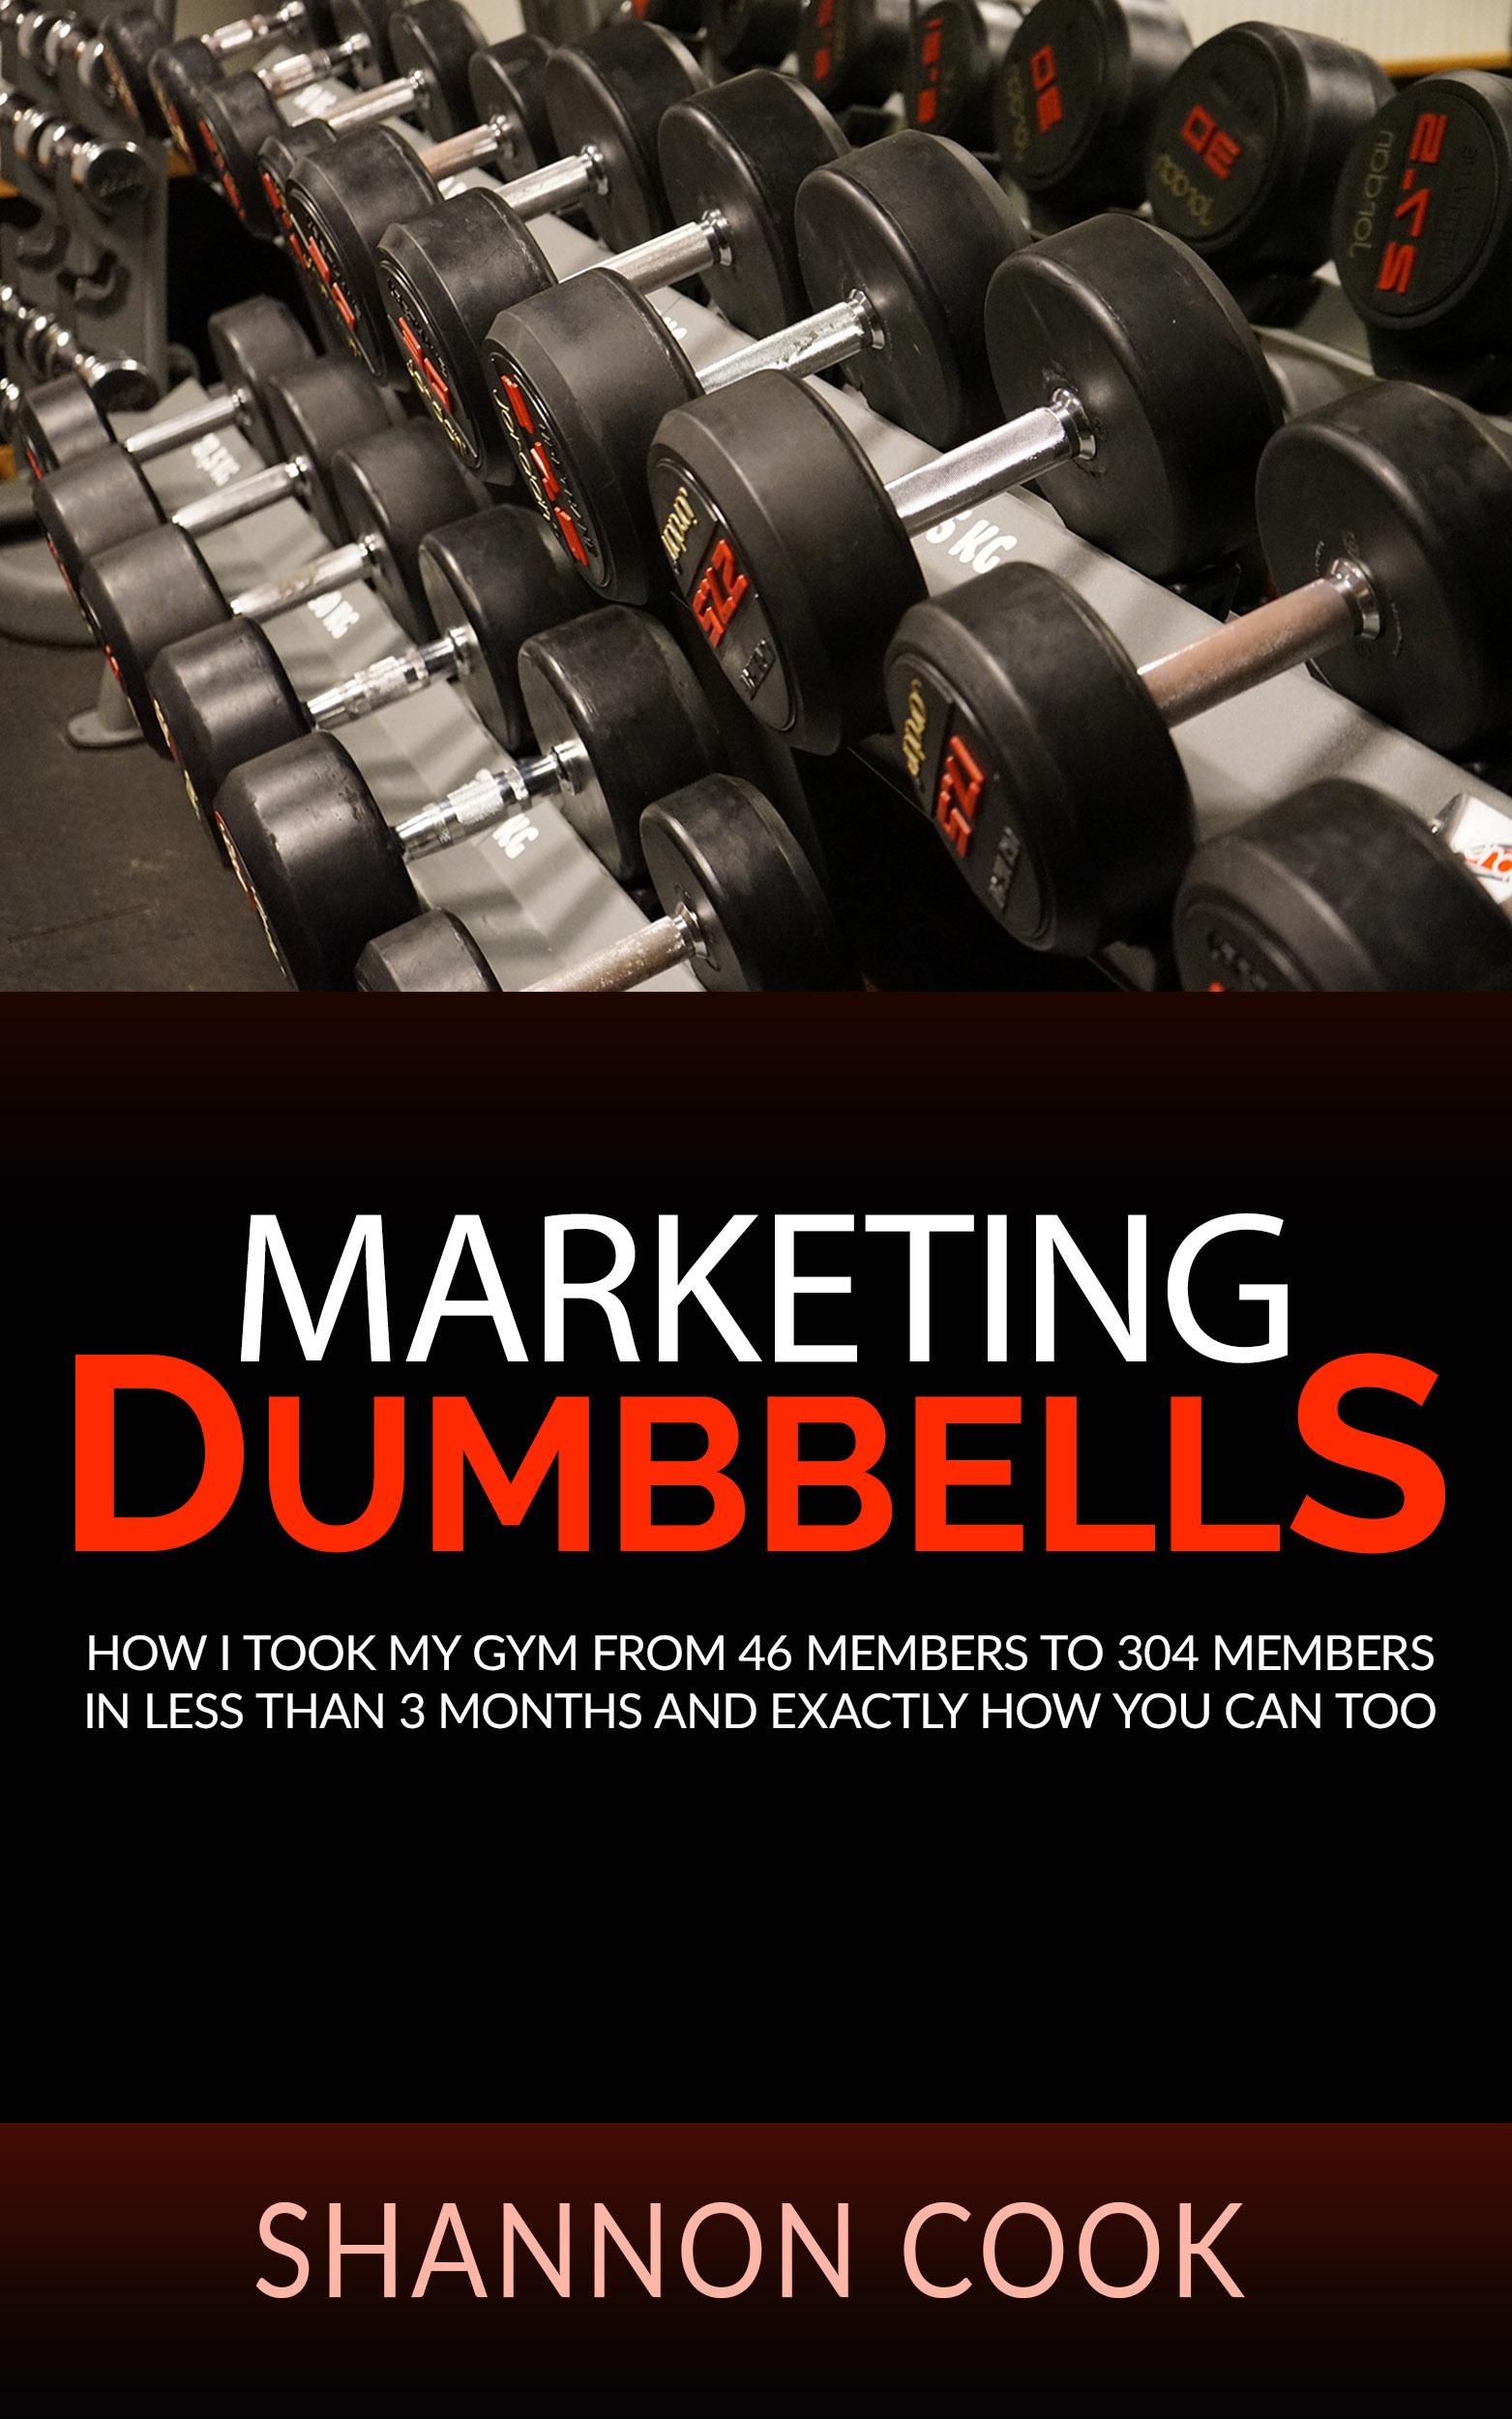 Marketing Dumbbells book